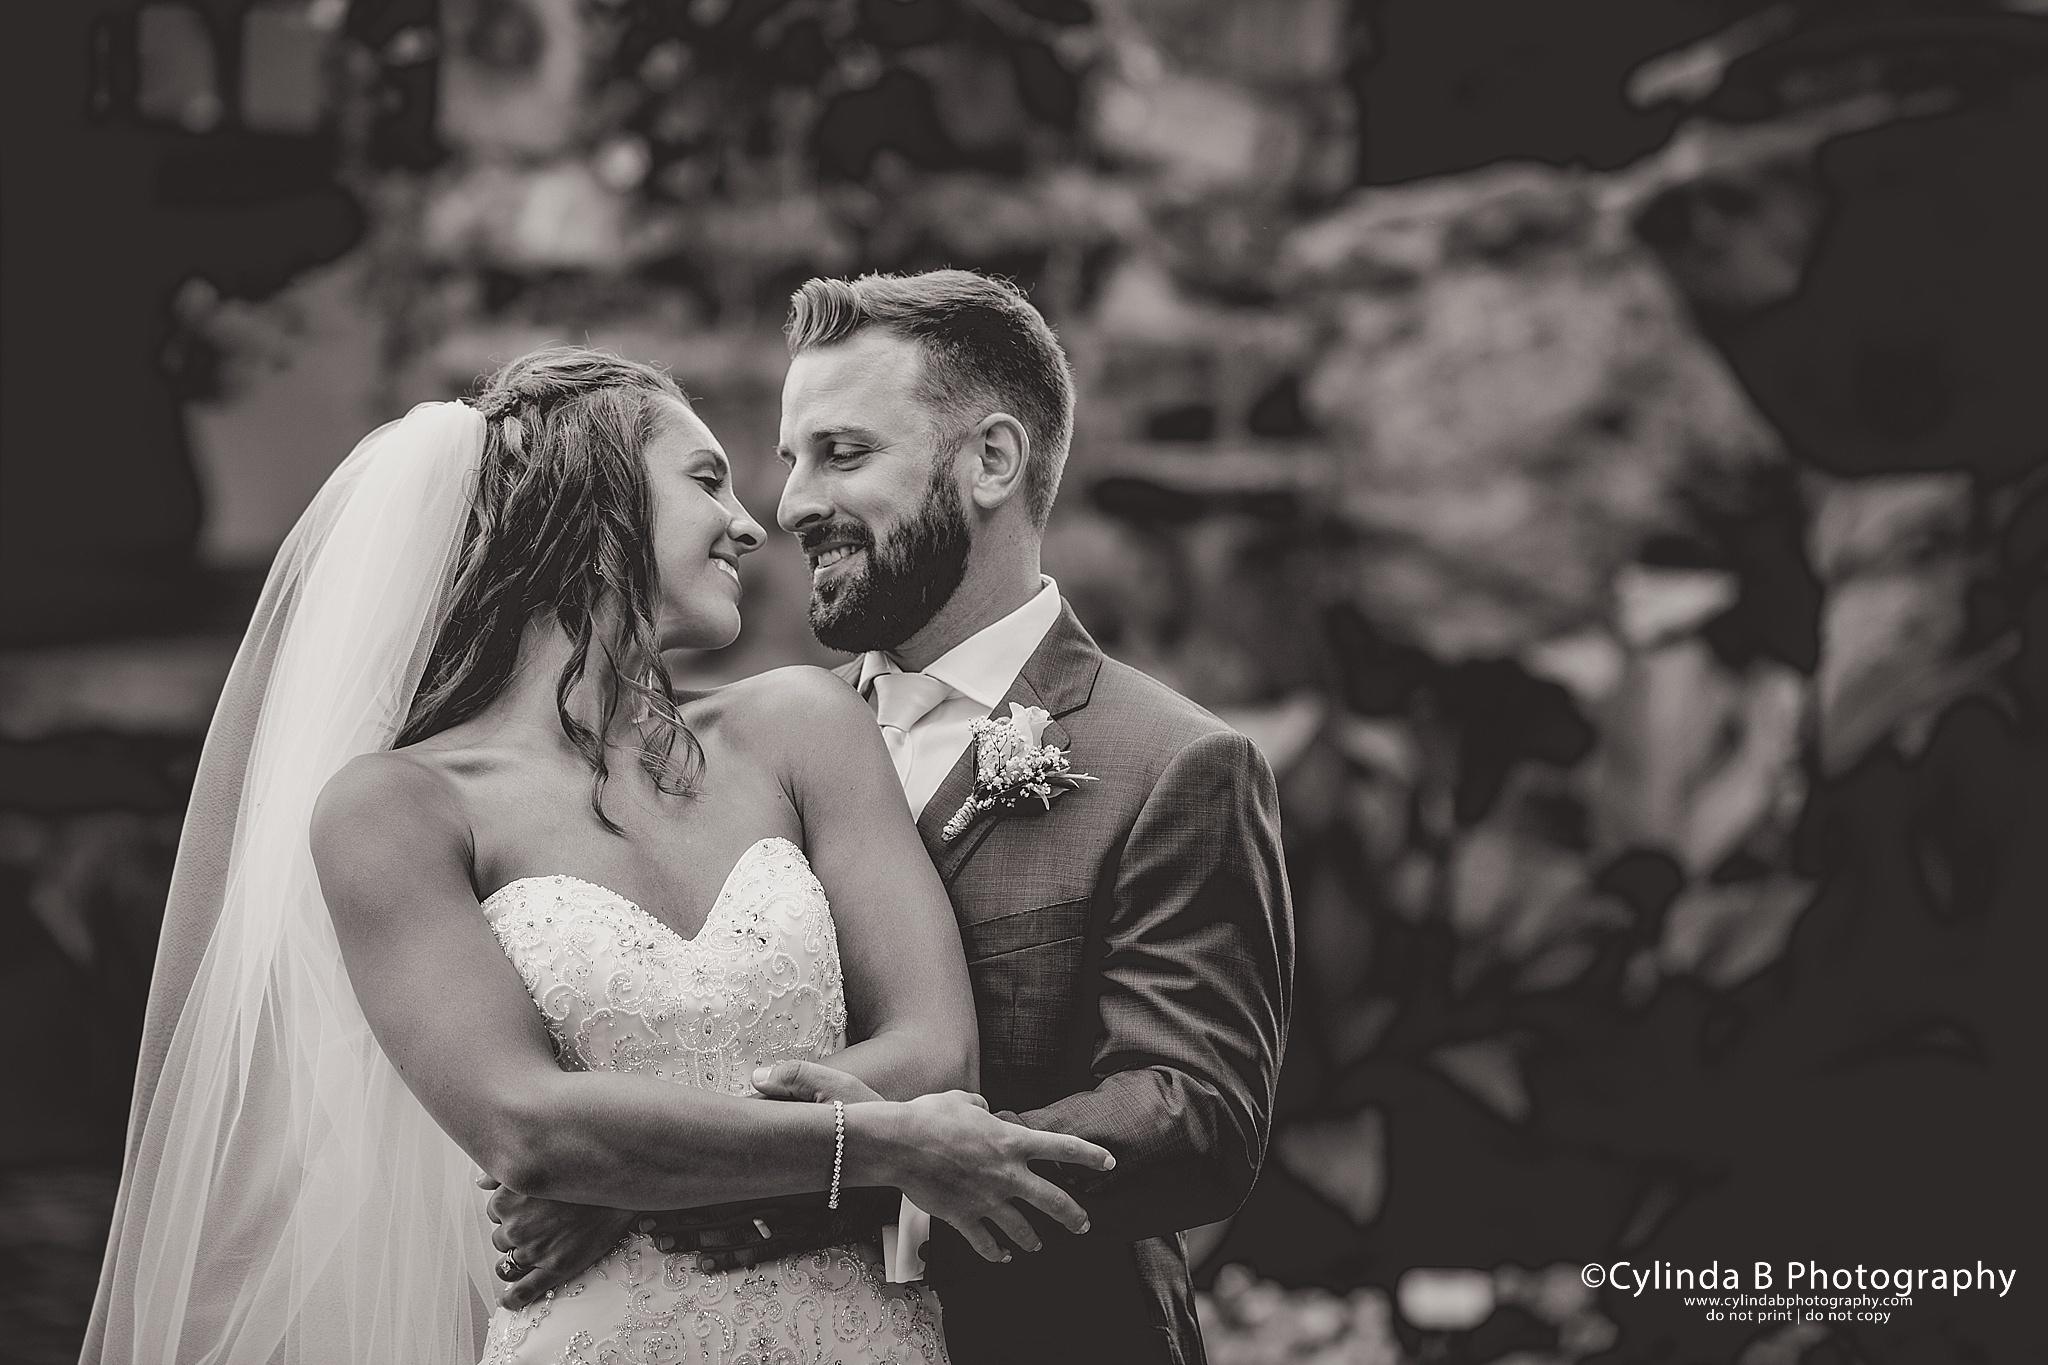 Boldt Castle Wedding, Alexandria Bay, Wedding, Photograper, Cylinda B Photography-31